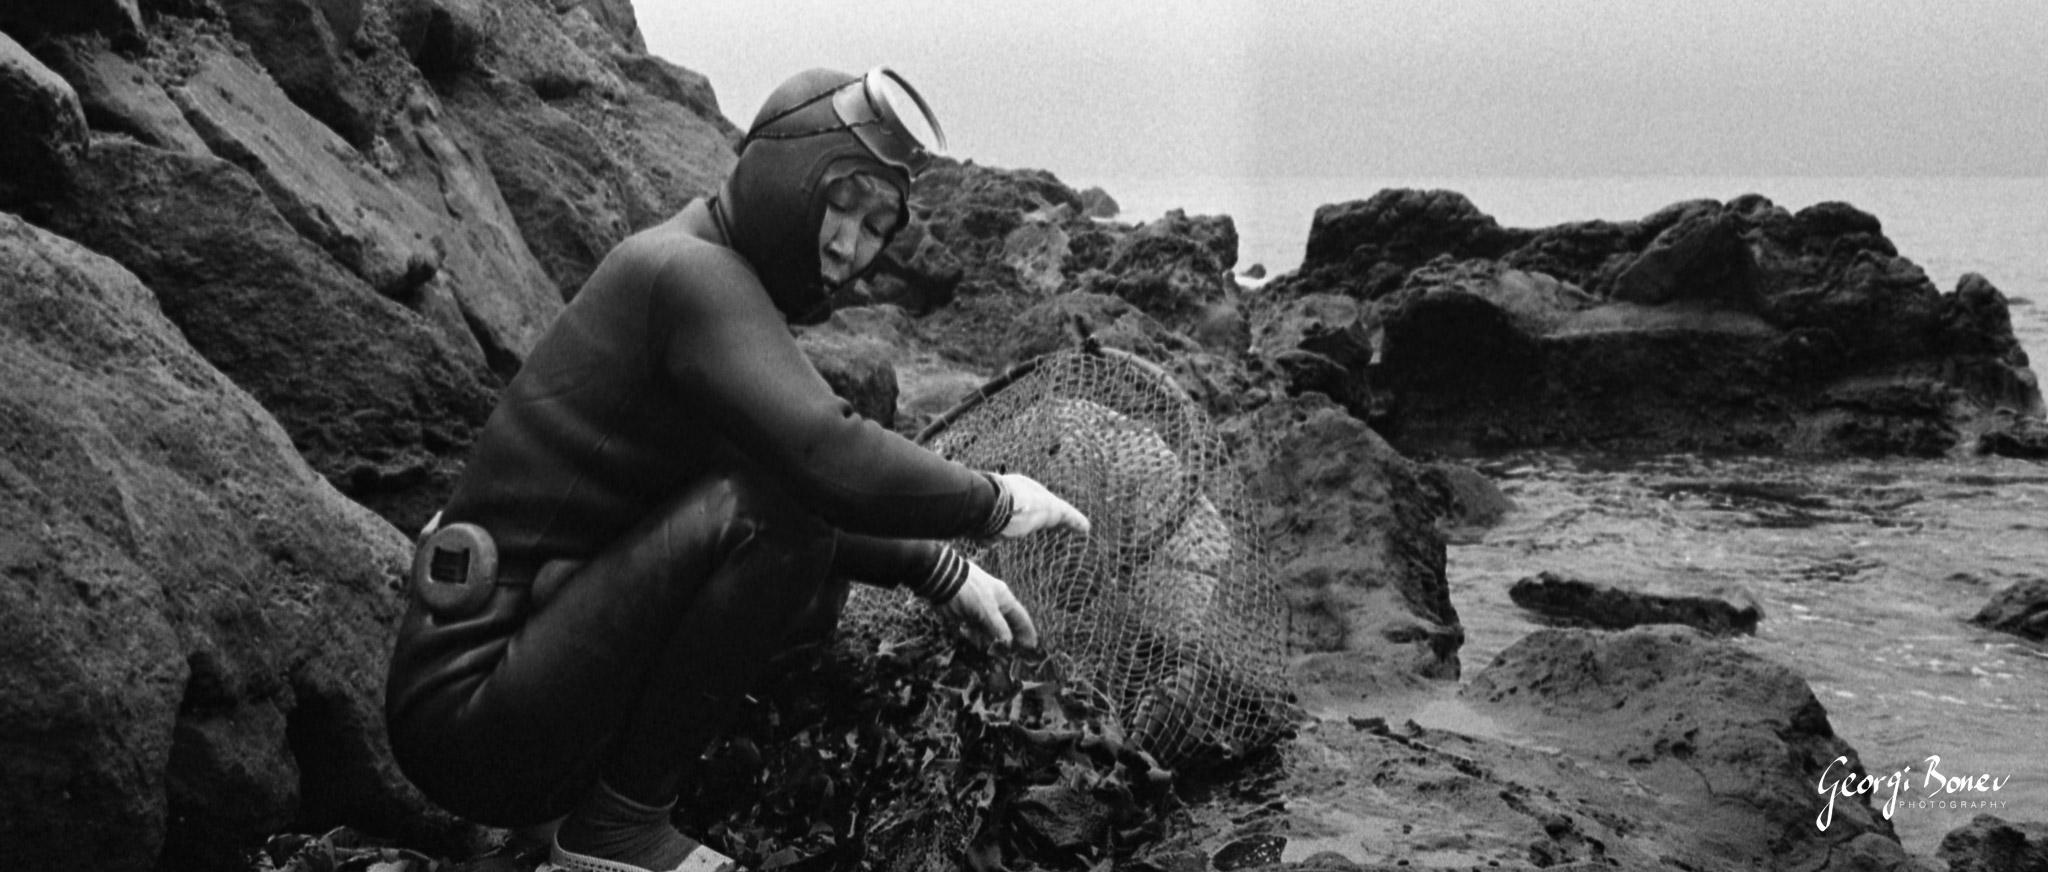 HAENYEON DIVER CHECKING THE CATCH, JEJU ISLAND, KOREA